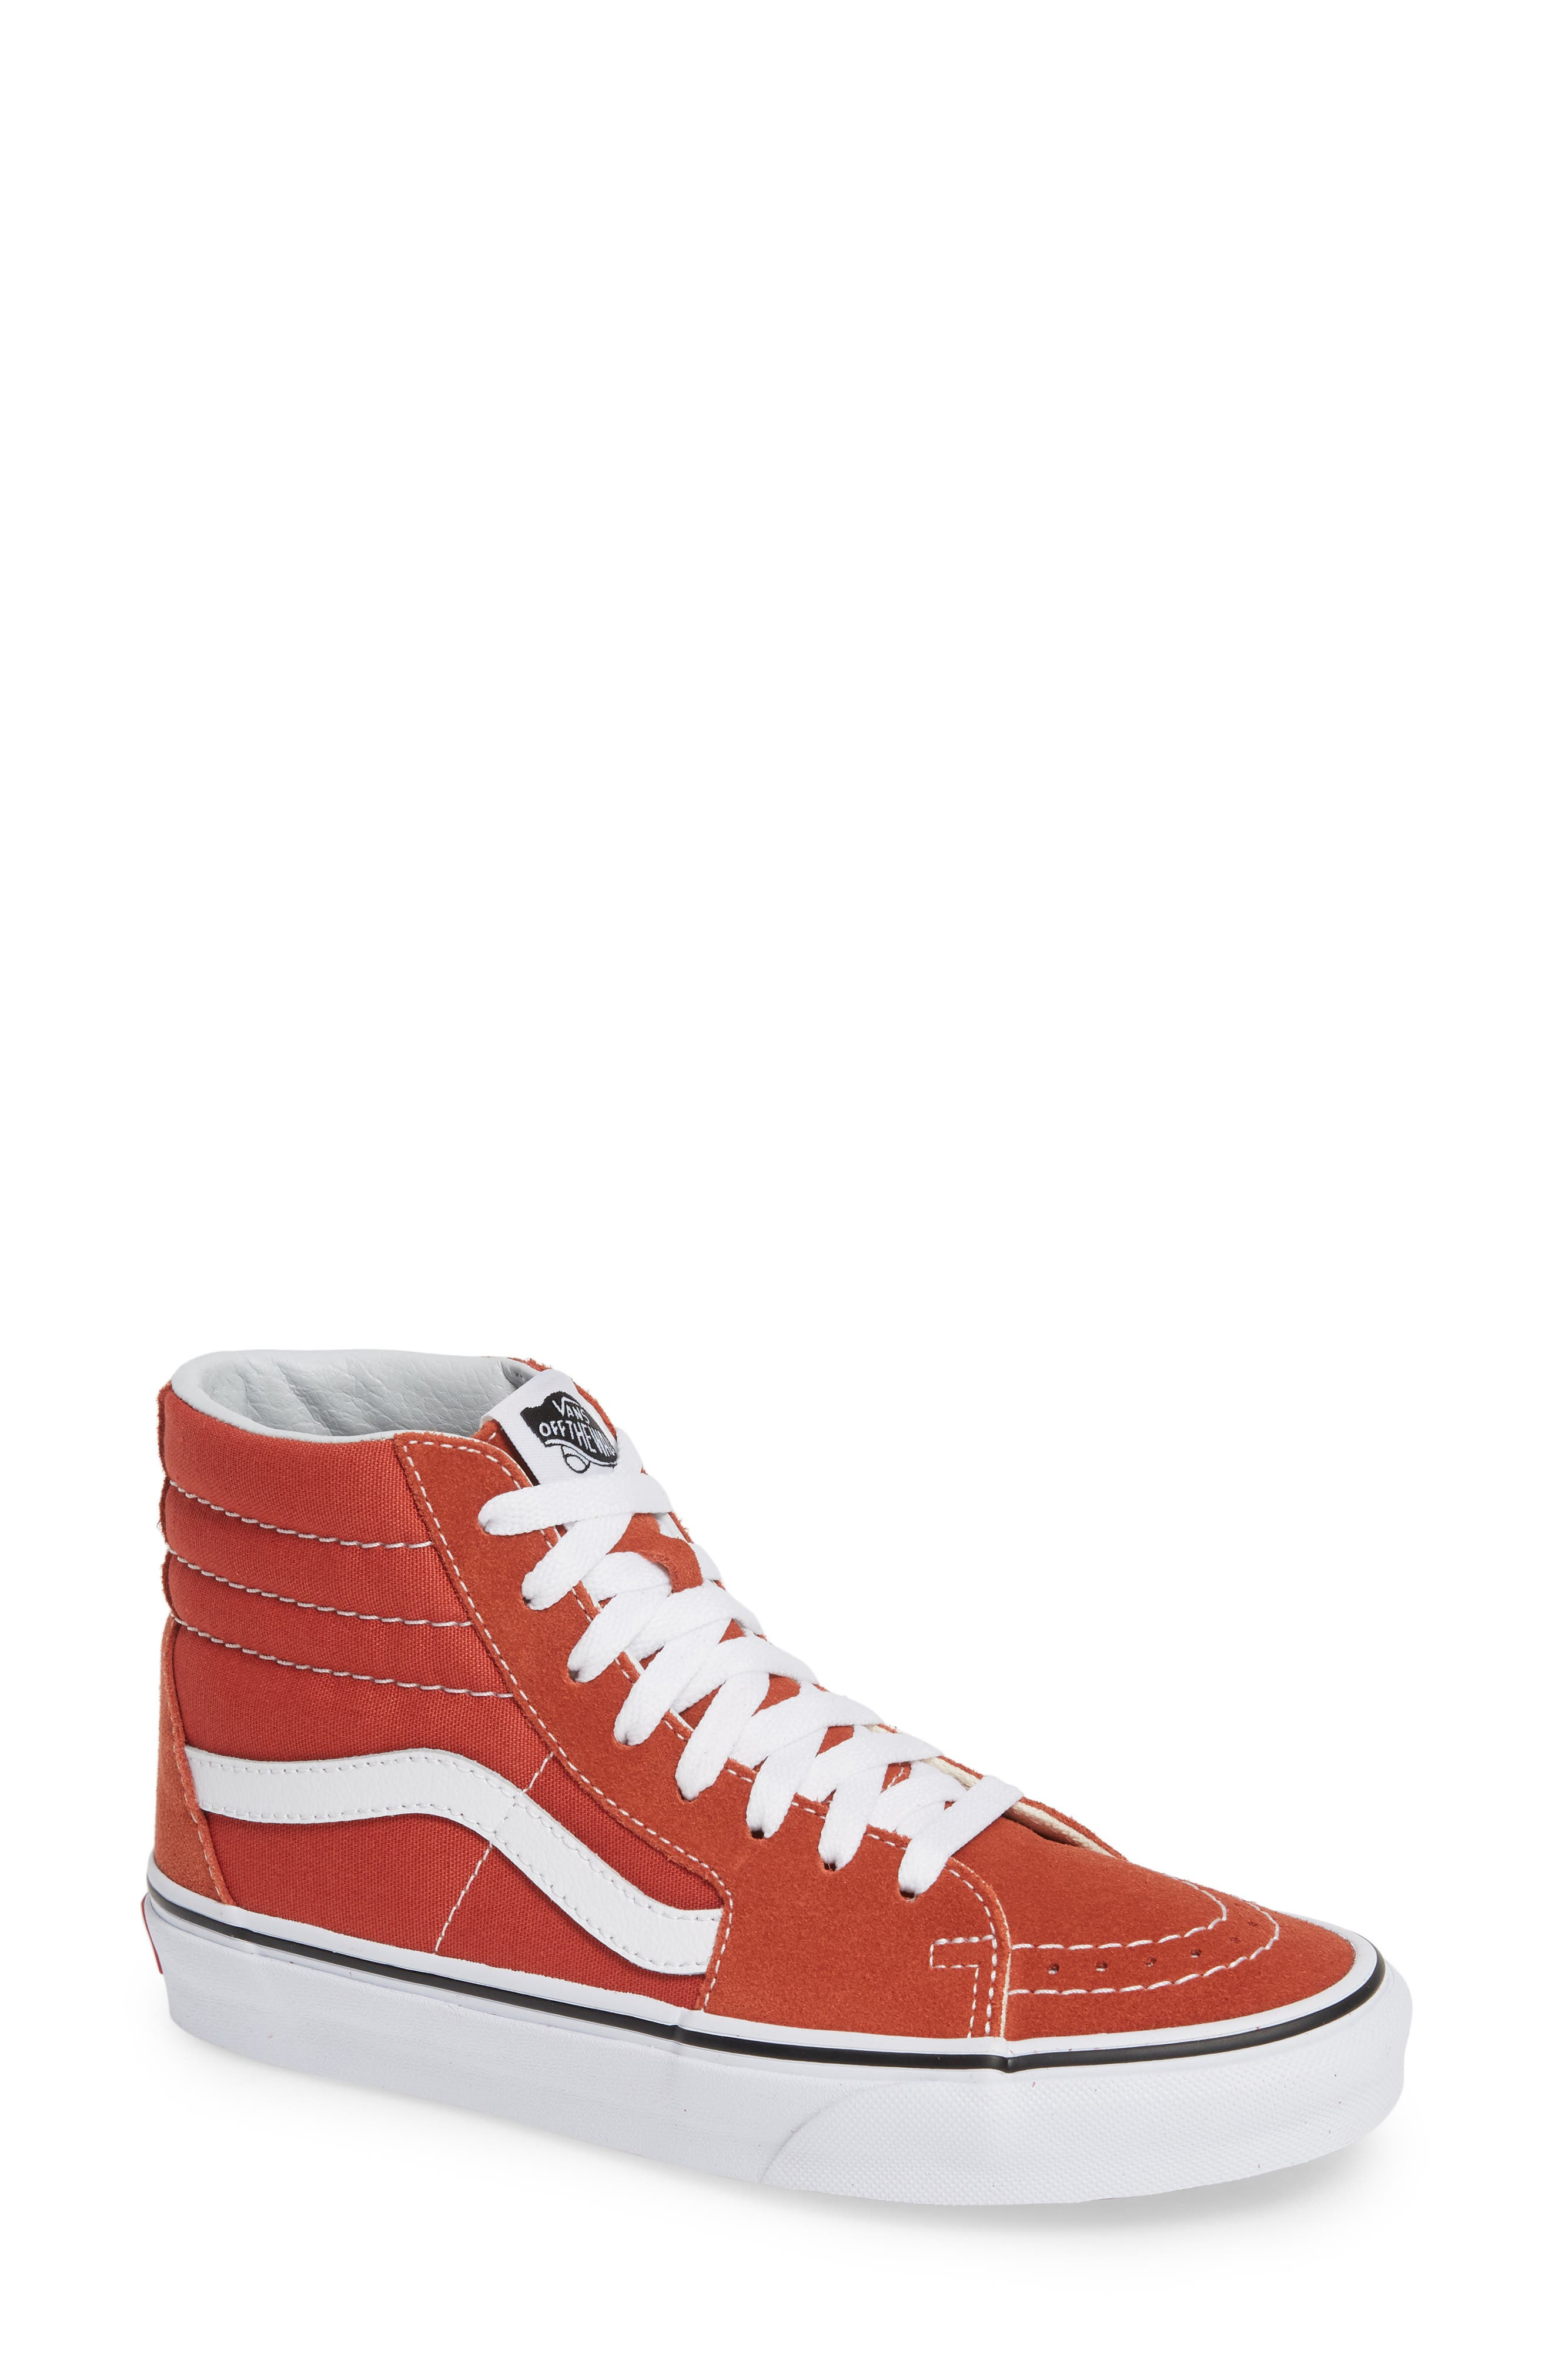 9d9a28611b Women s High Top Sneakers   Running Shoes